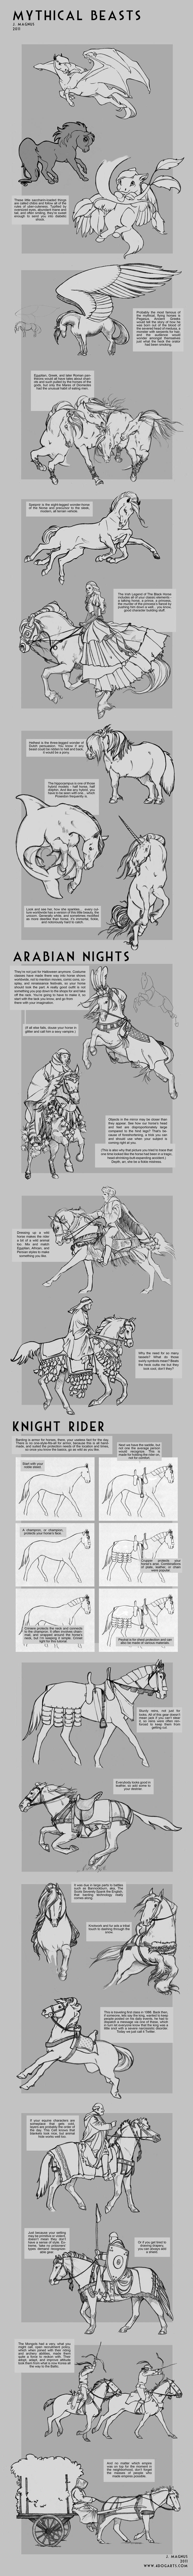 Myth +Costume Horse Tutorial by sketcherjak.deviantart.com on @deviantART